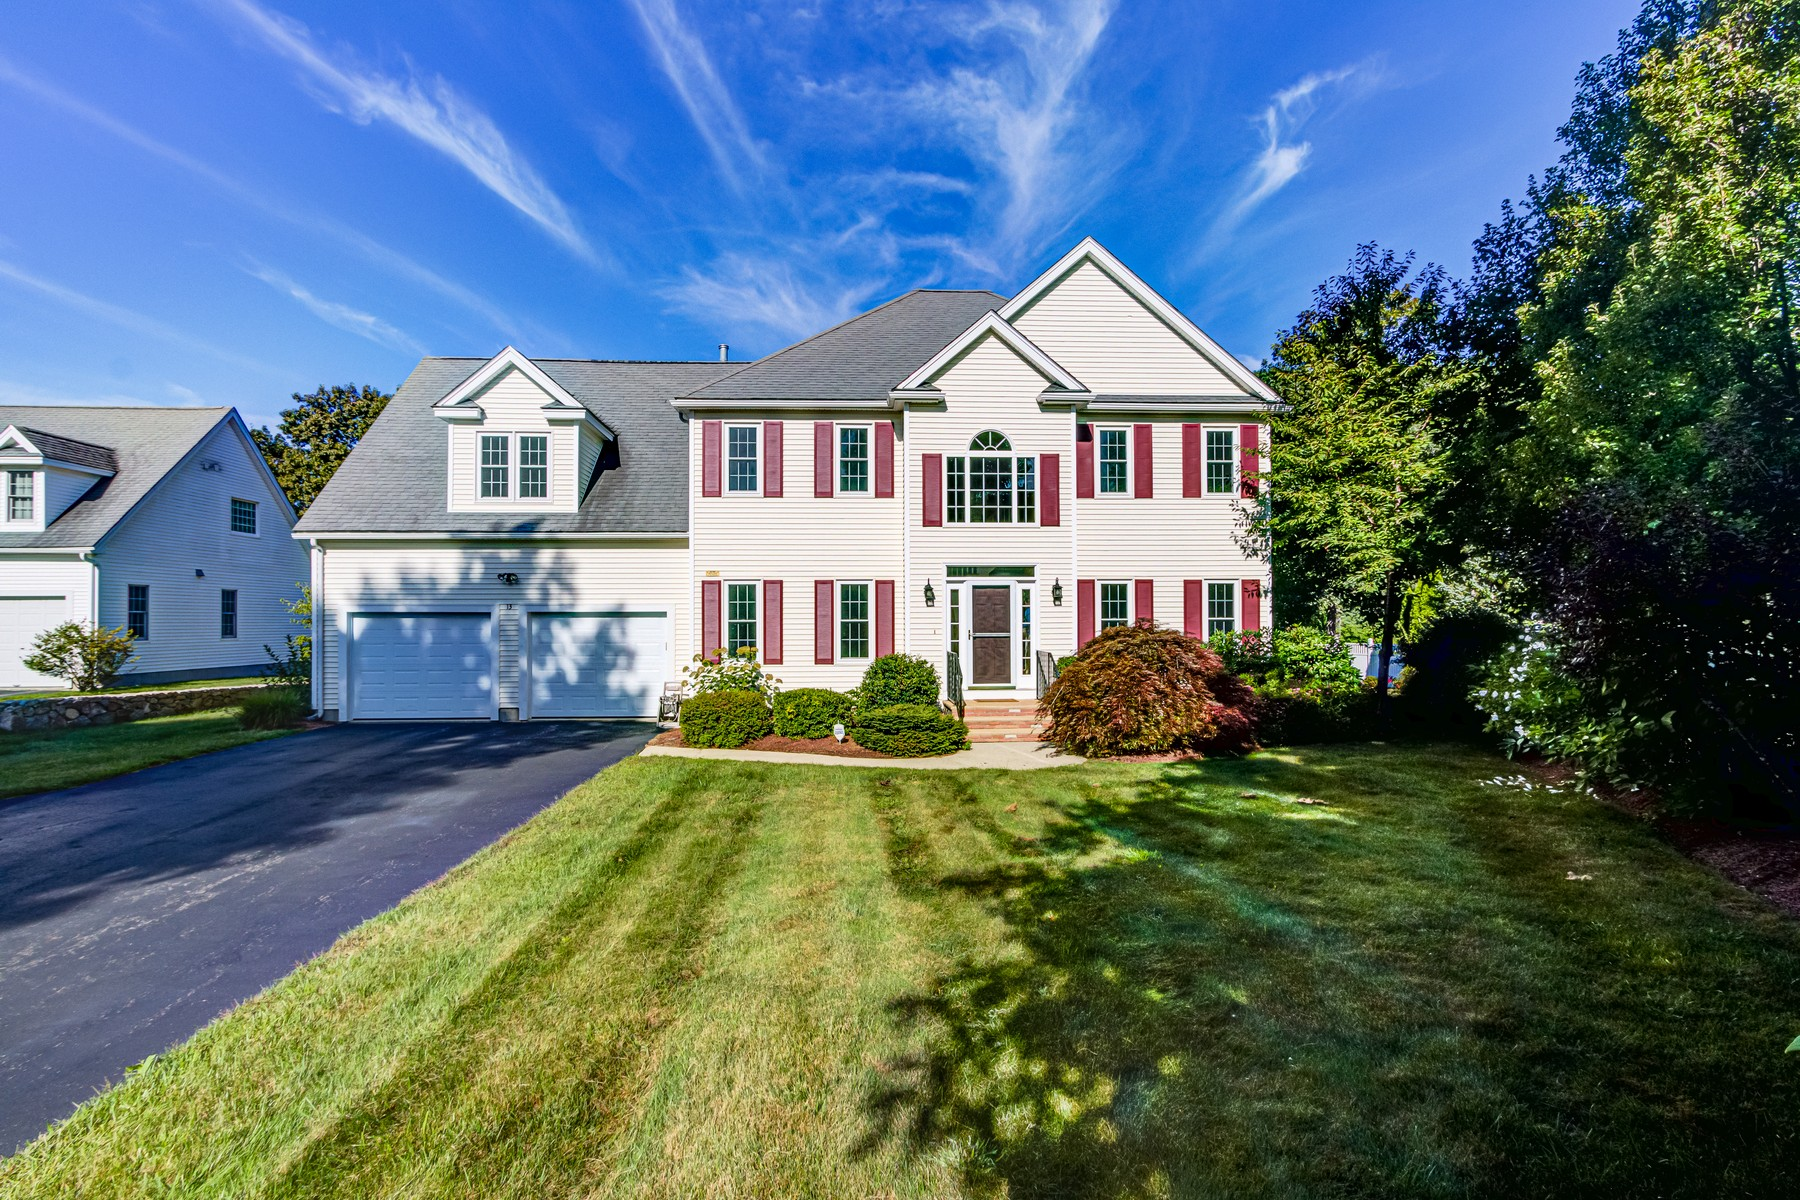 Single Family Homes por un Venta en Bright And Meticulously Maintained Colonial 13 Muir Way Marlborough, Massachusetts 01752 Estados Unidos